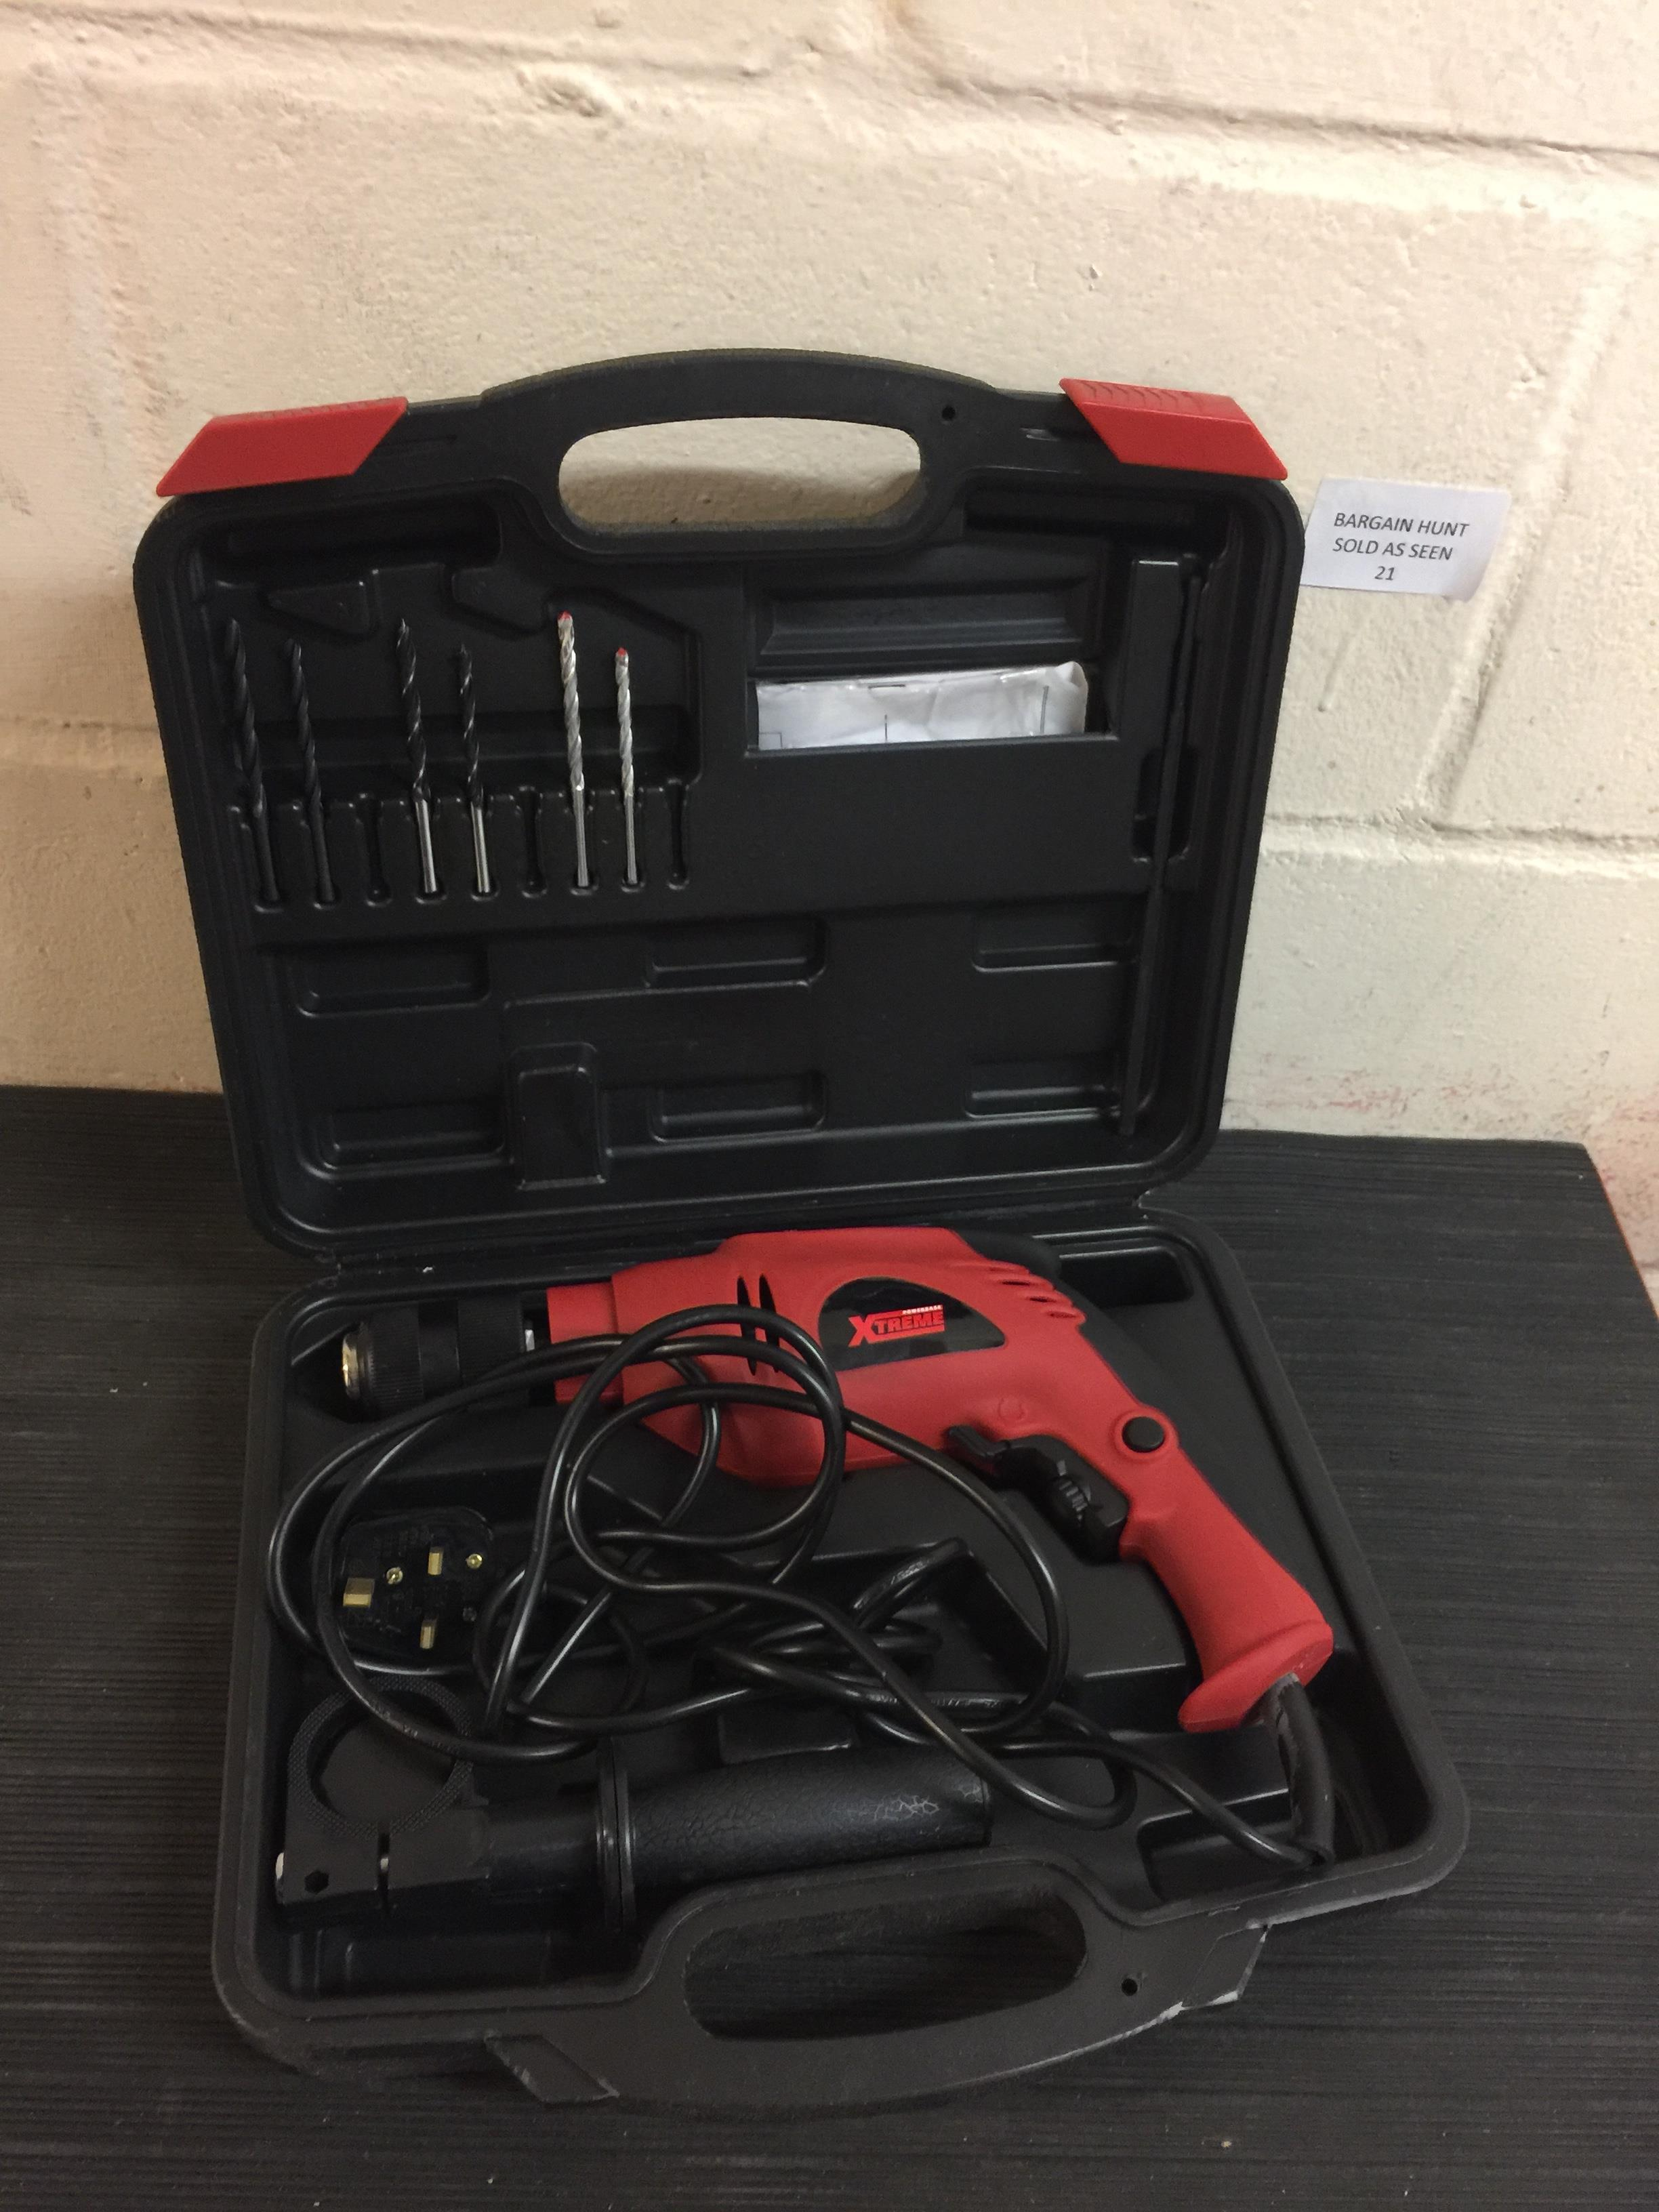 Lot 21 - Powerbase Xtreme Drill